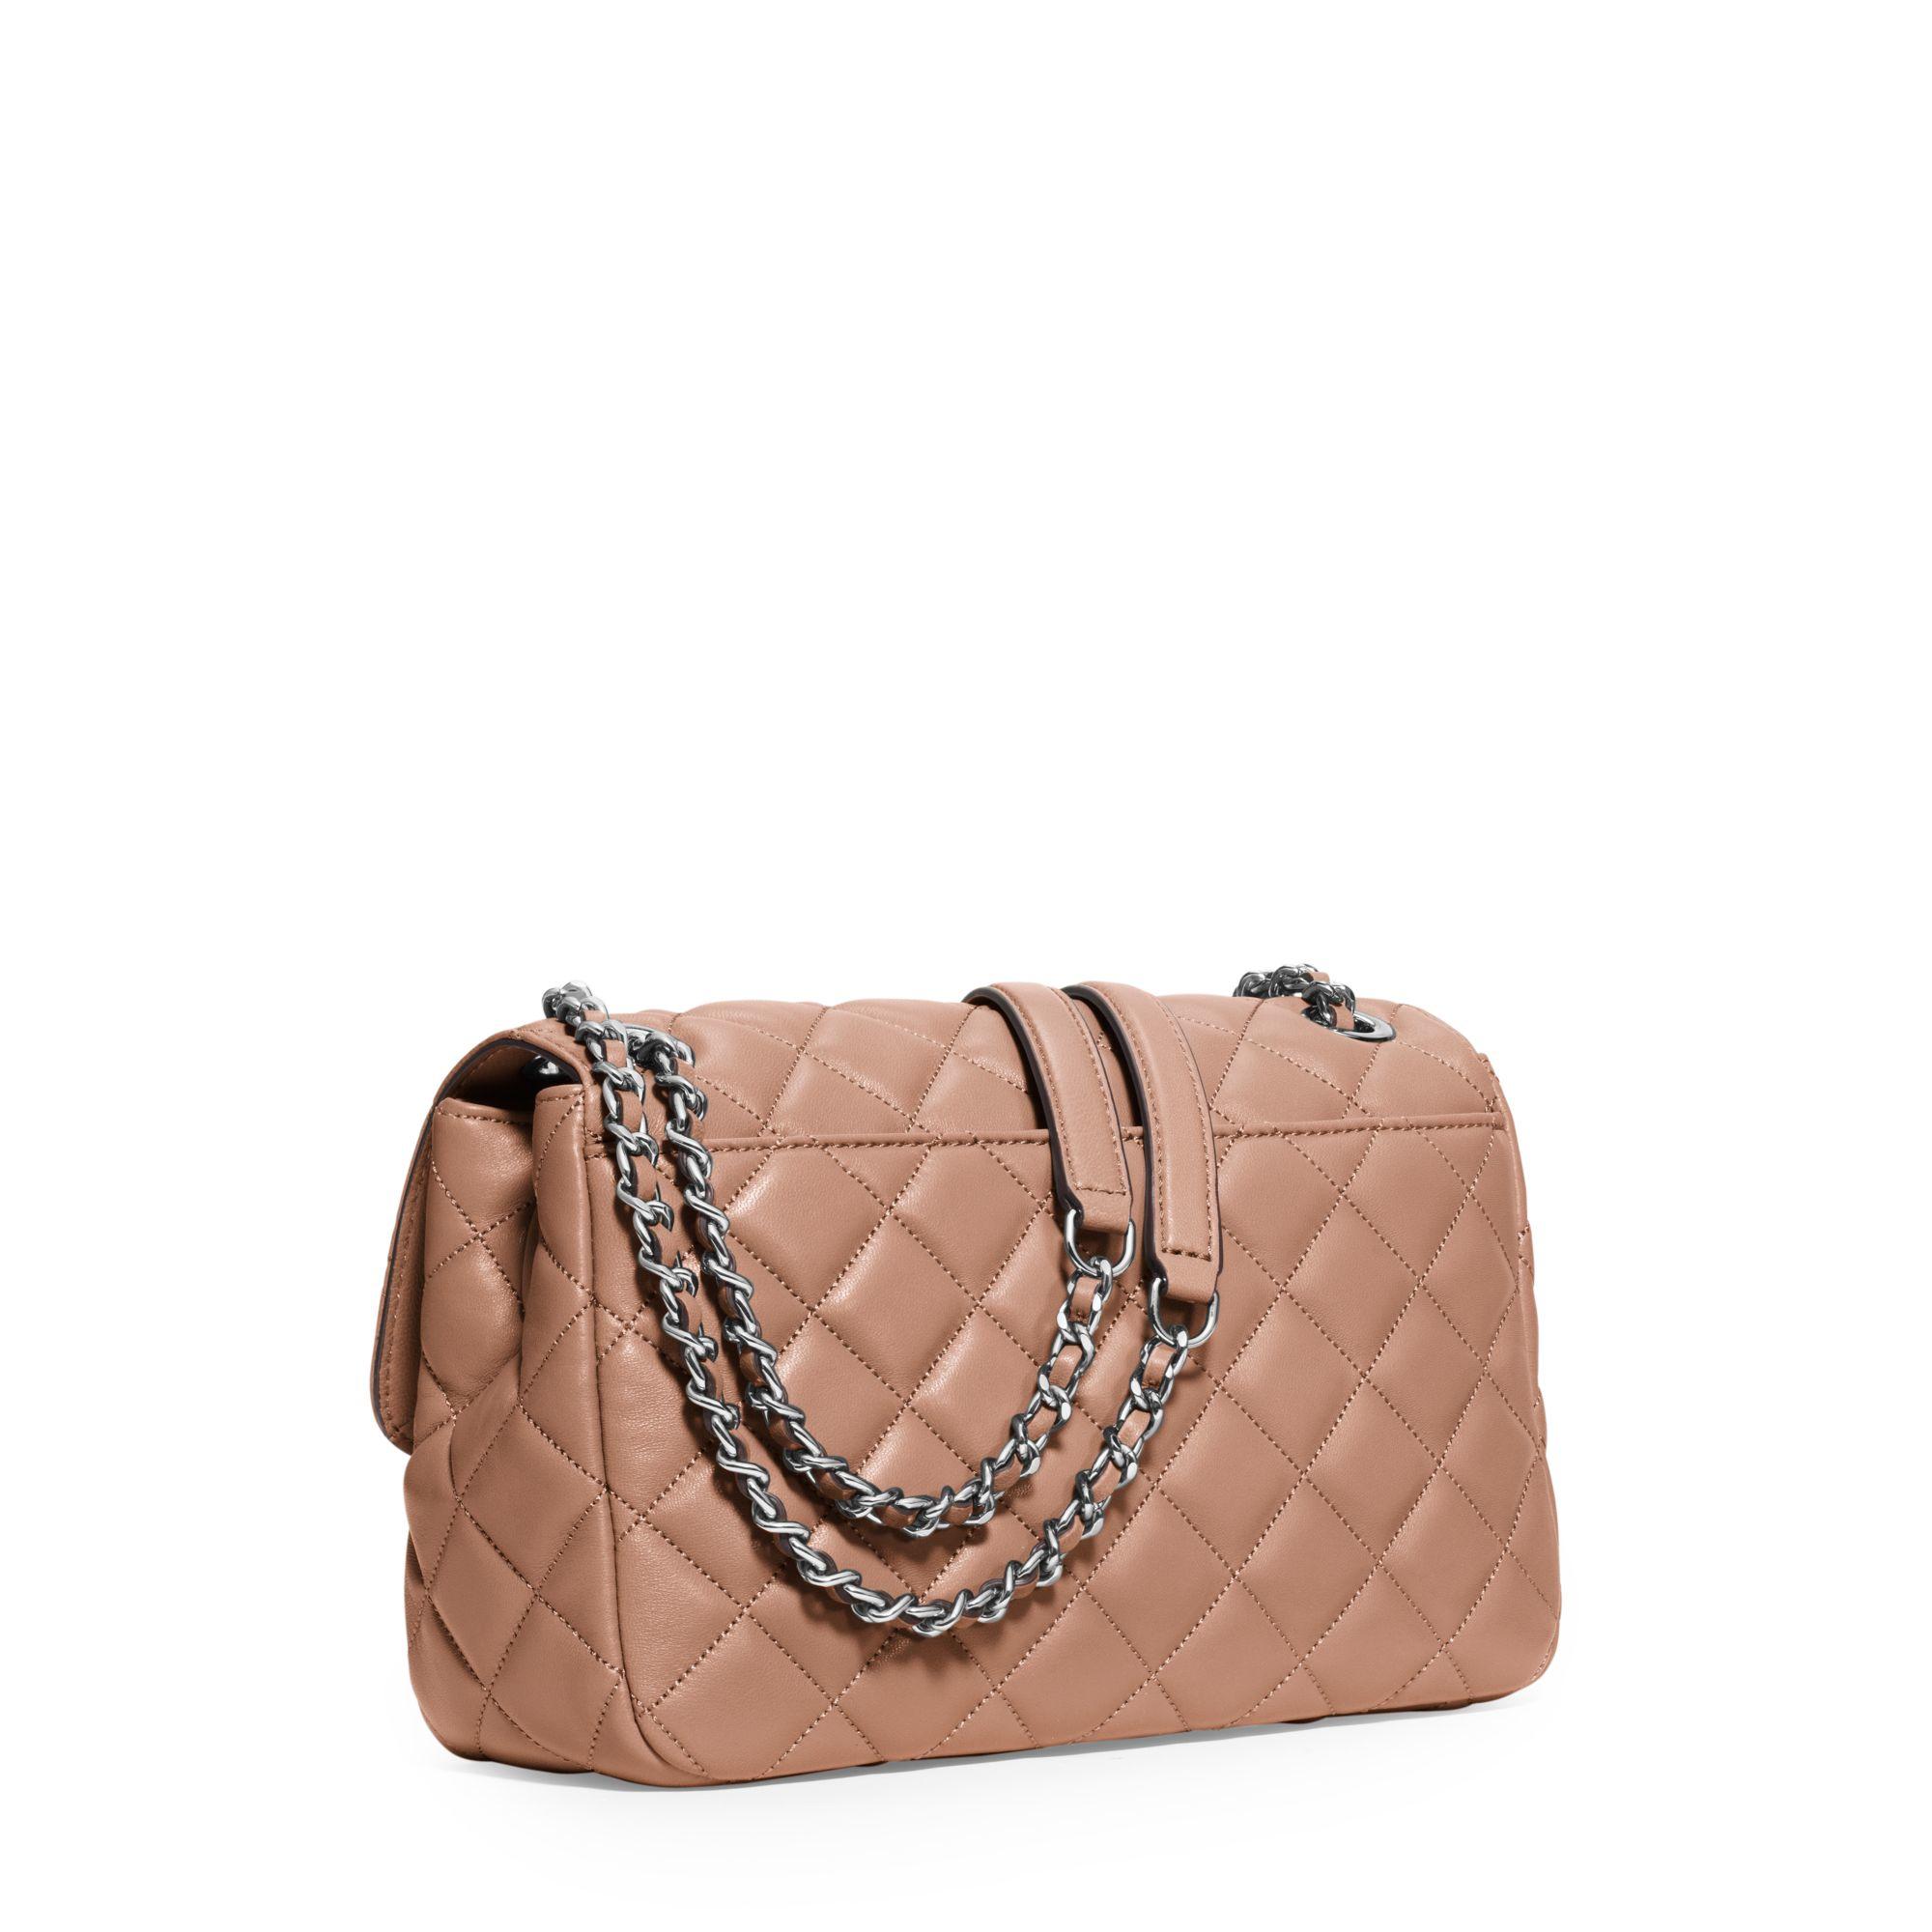 Lyst - Michael Kors Sloan Large Quilted-leather Shoulder Bag in Pink 23b7432fb